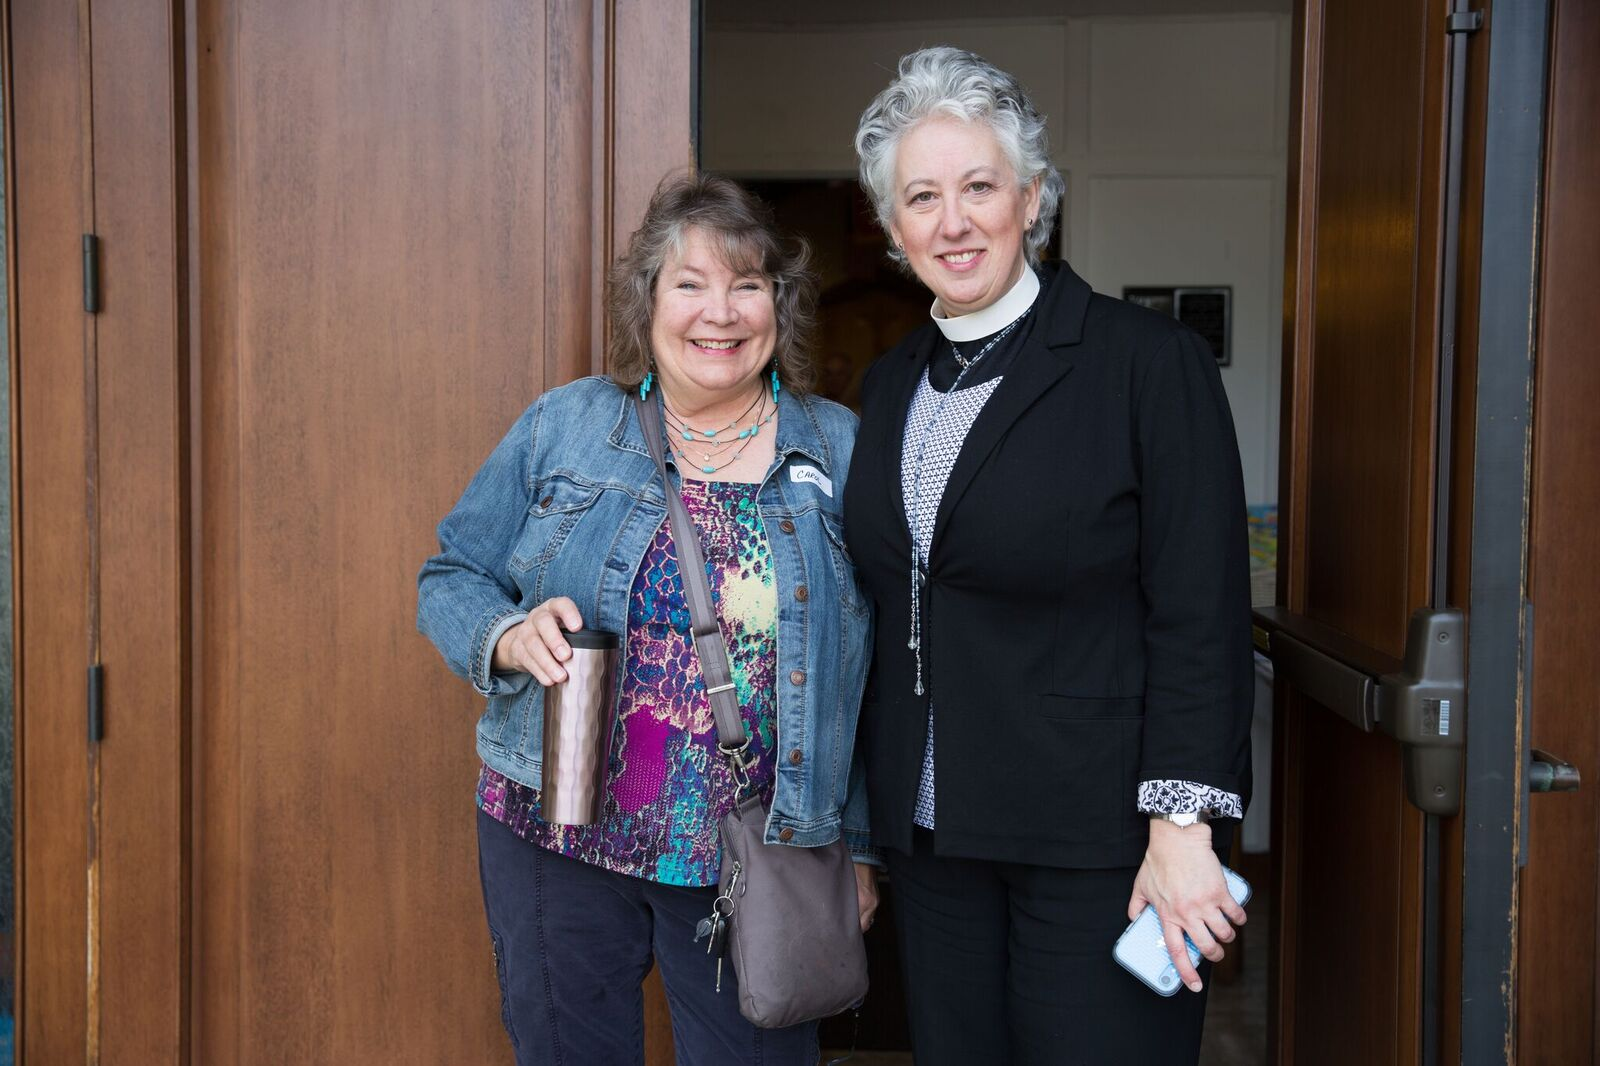 The Rev. Jill Honodel with parishioner Carol Richardson.